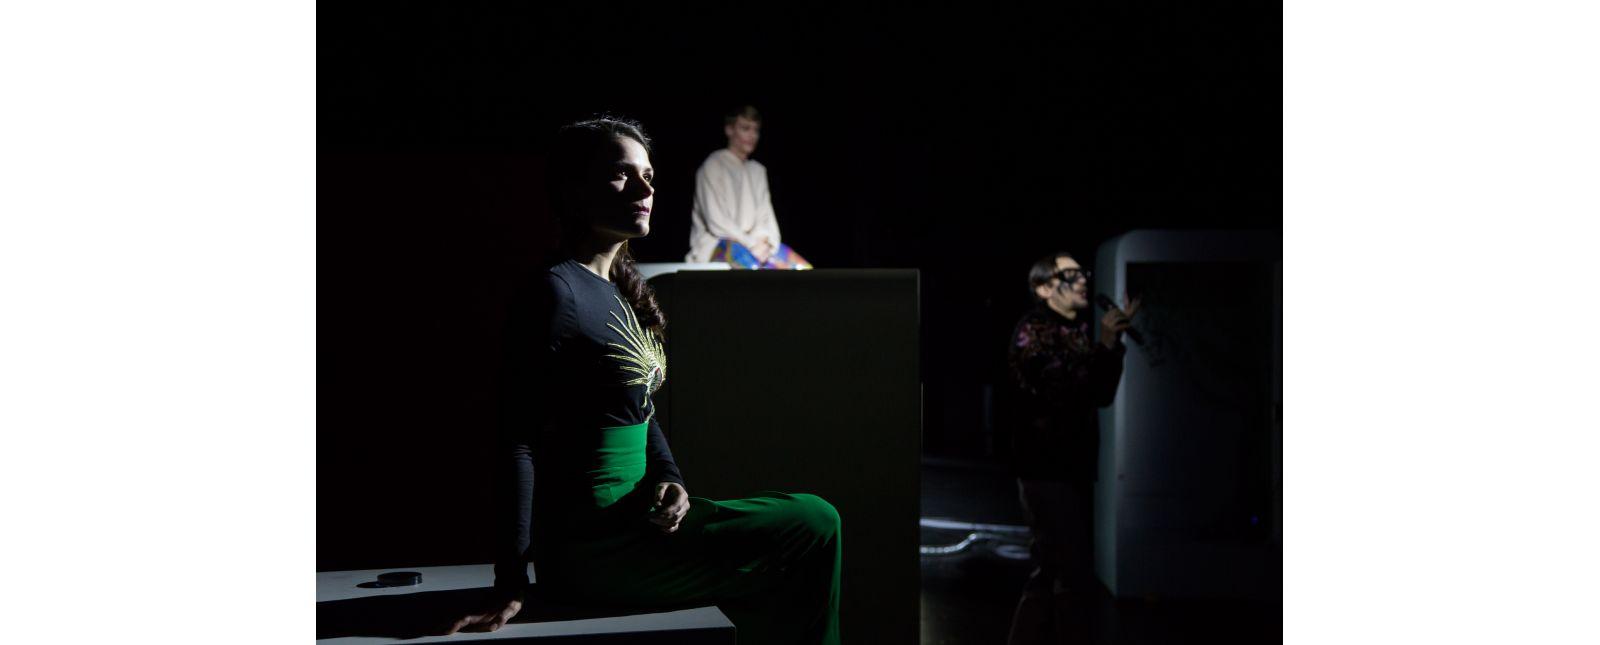 Der goldne Topf // Katharina Ruckgaber // Martin Hohner // Victor Calero // 2018 // Laura Nickel